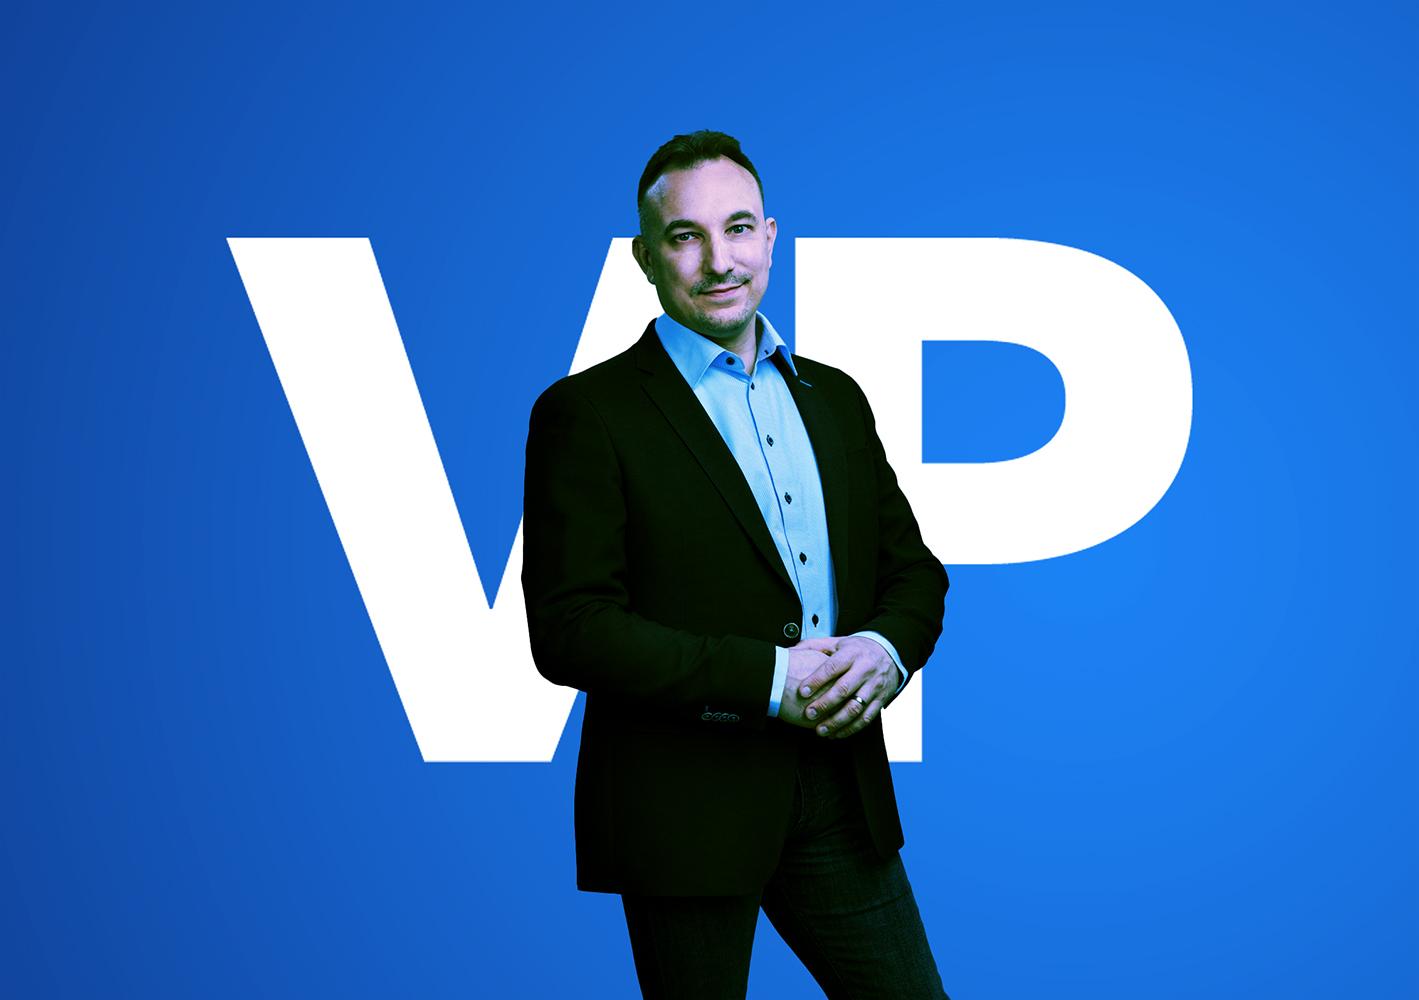 Vesa-Pekka Heikkinen, Vice President, Service Business